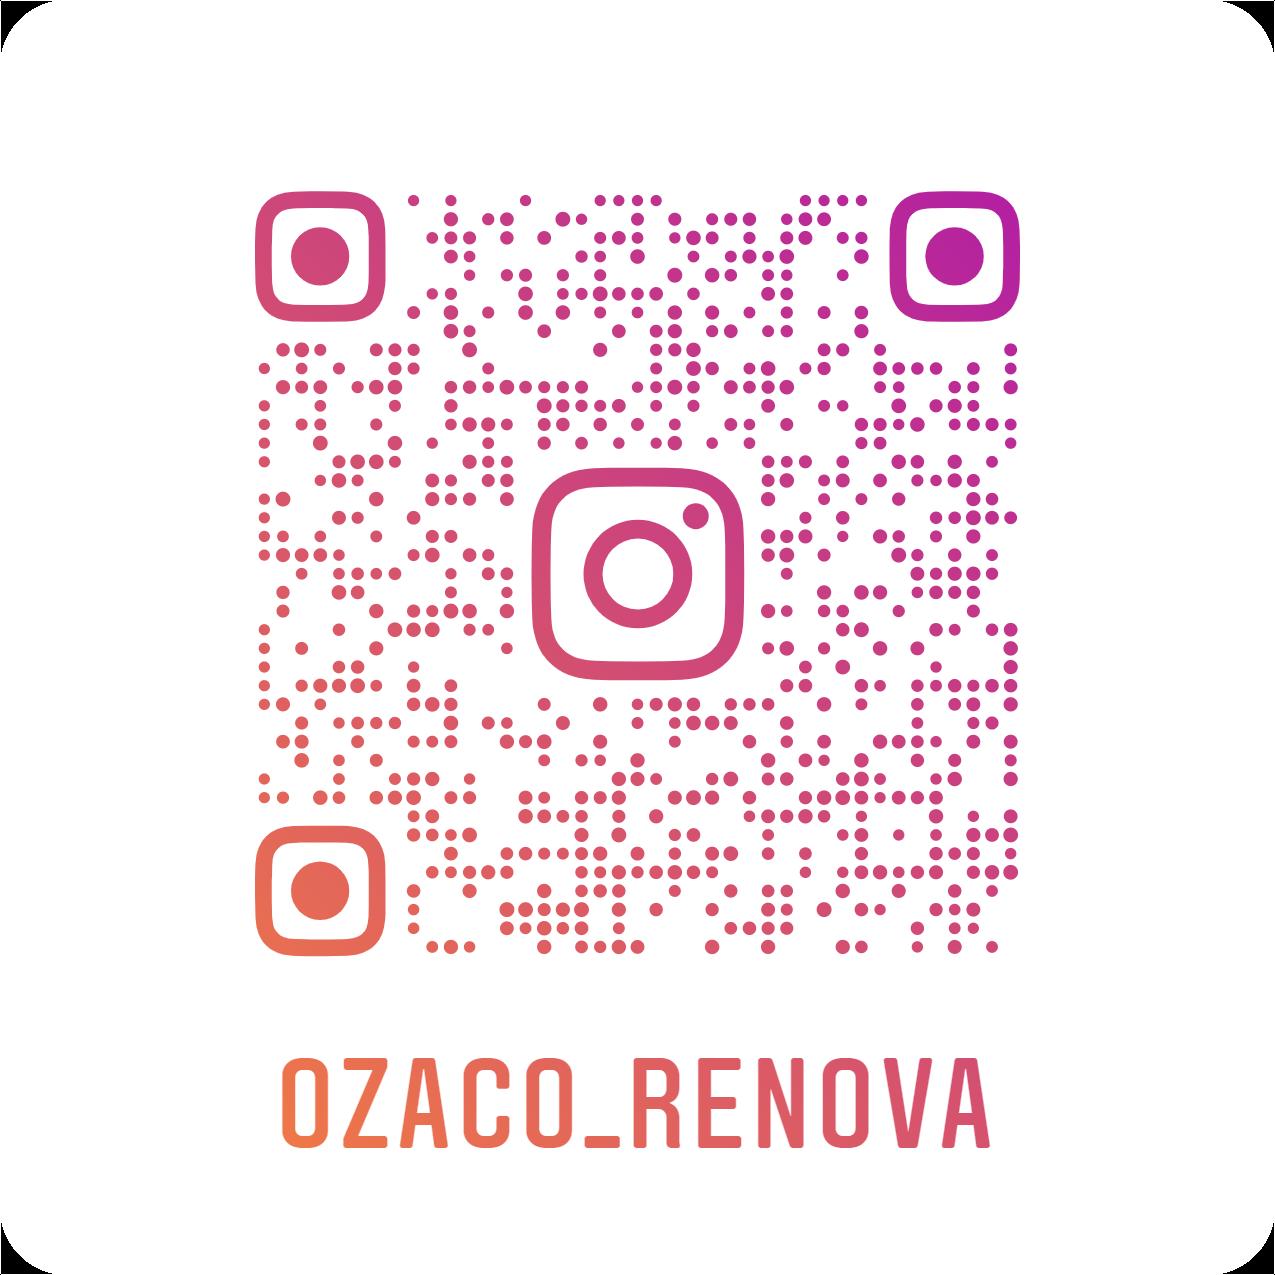 ozaco_renova_nametag